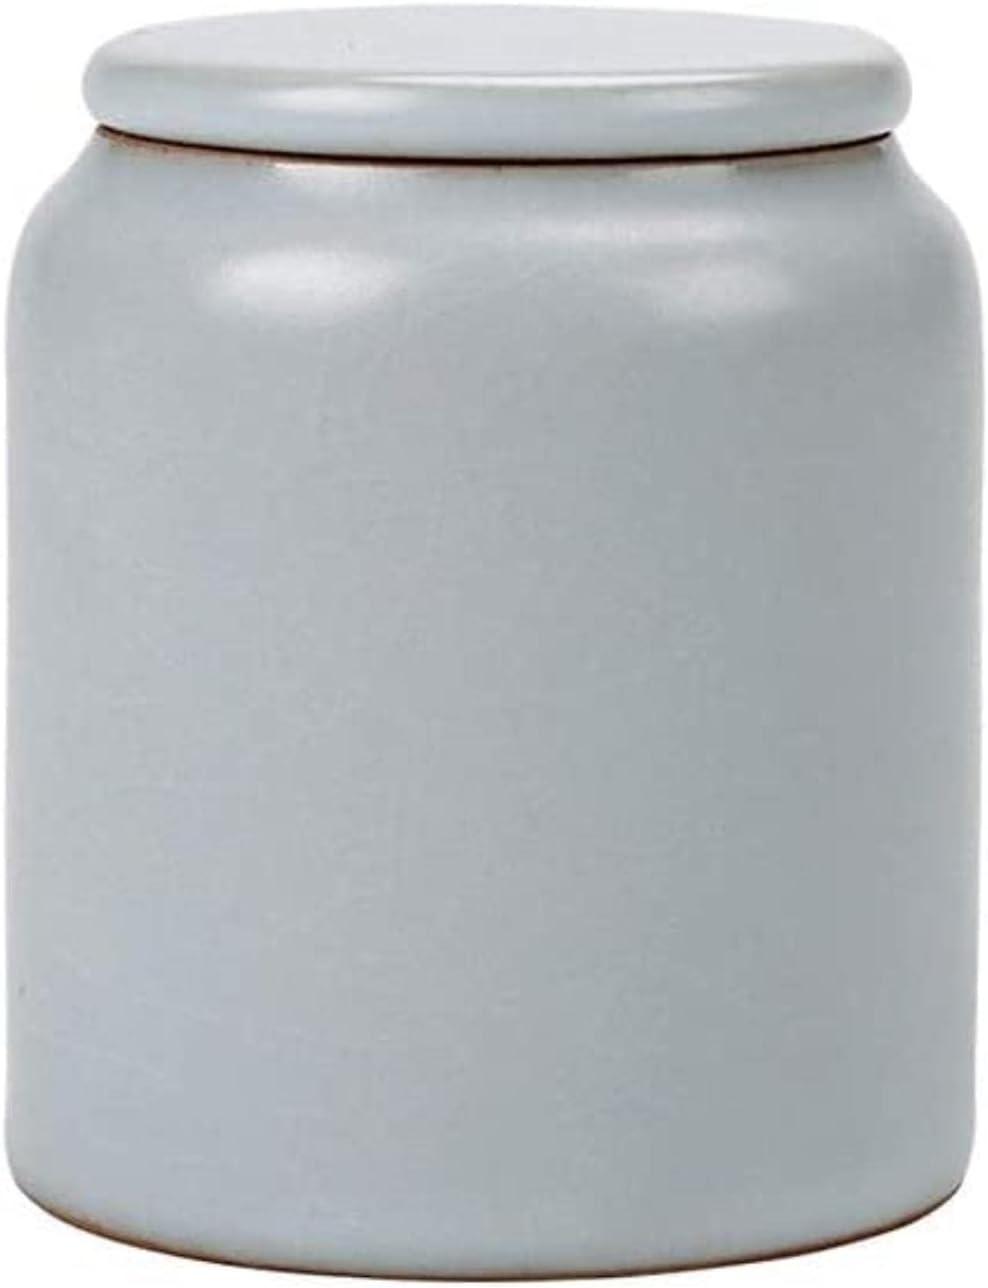 XKun Blue White 4.7x5.6cm Tool Charlotte Mall Color: Max 88% OFF